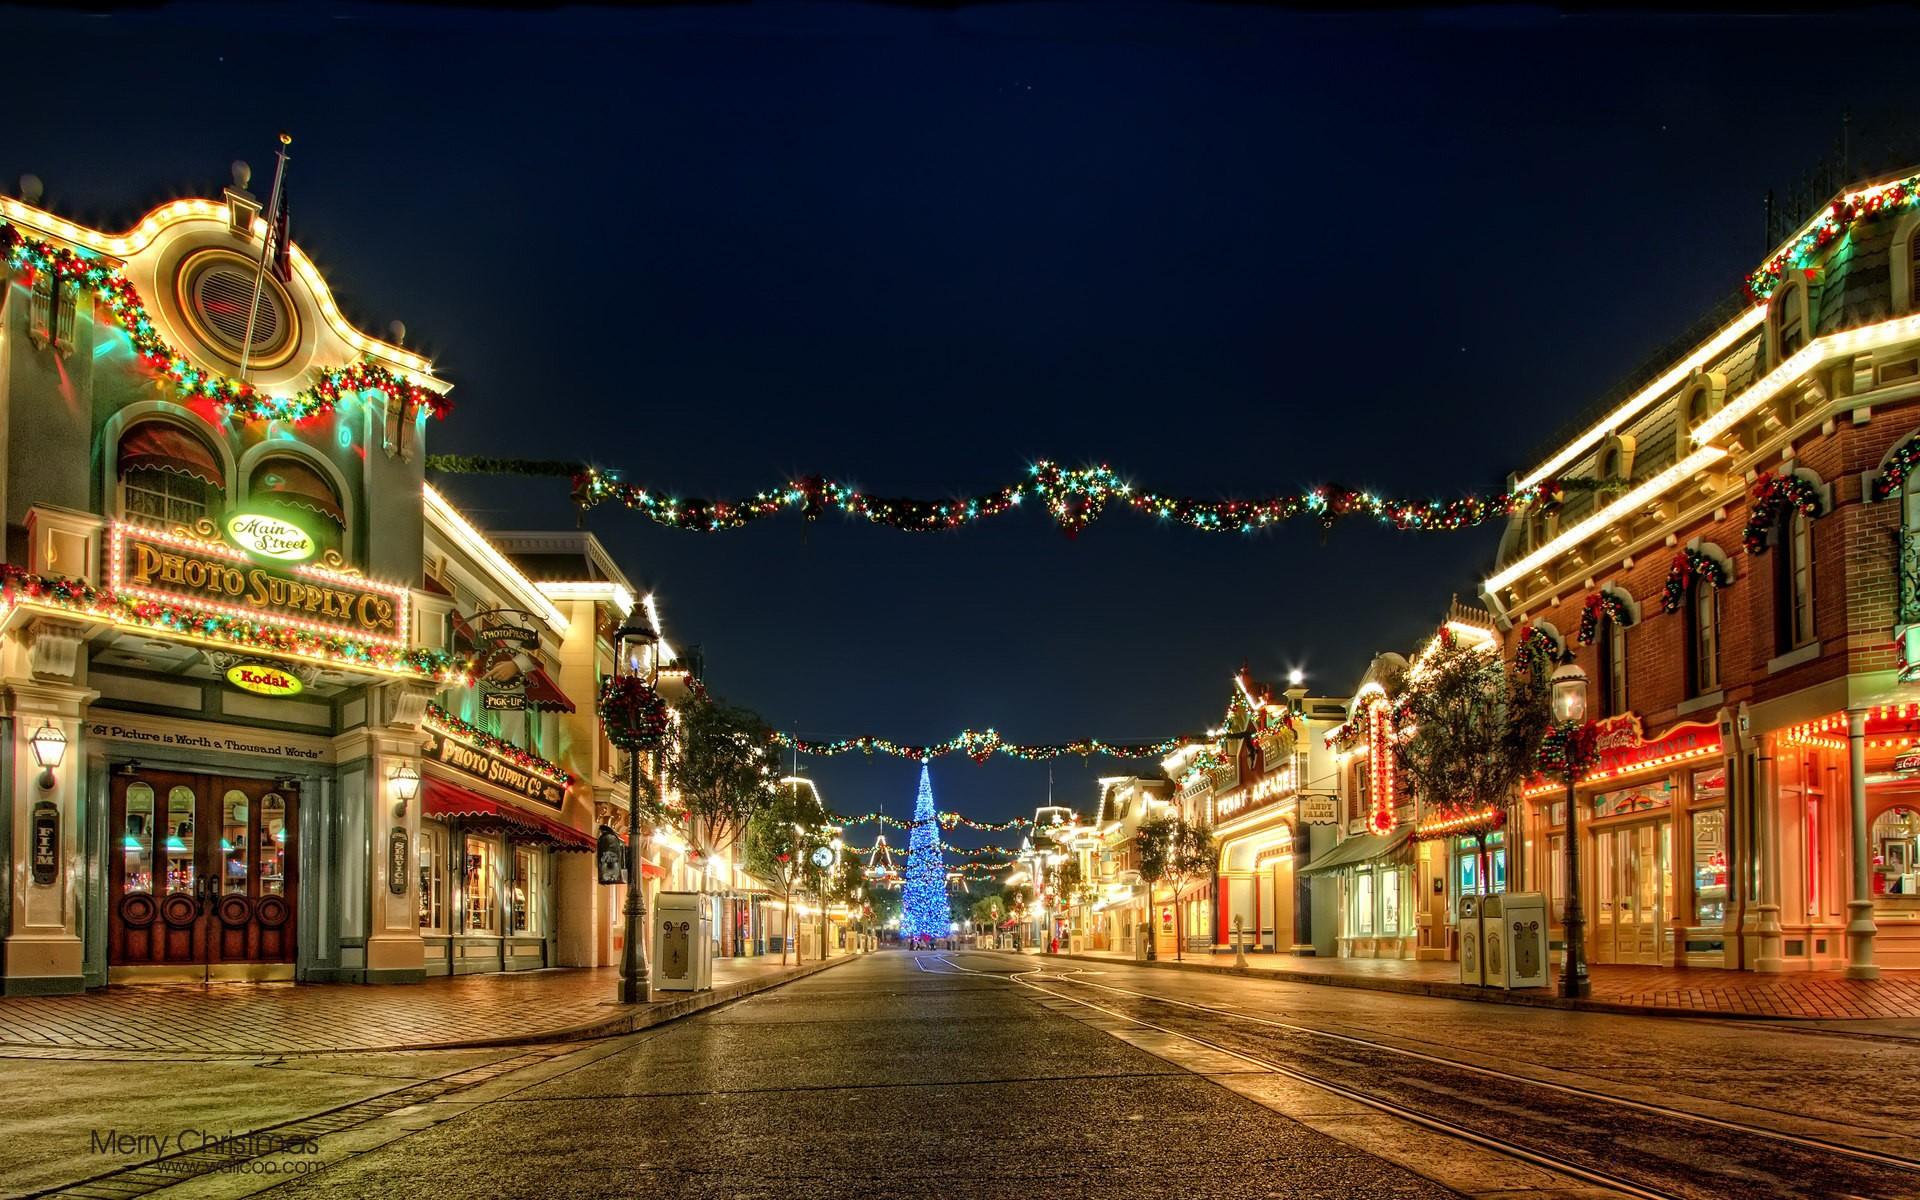 Calles decoradas por navidad - 1920x1200